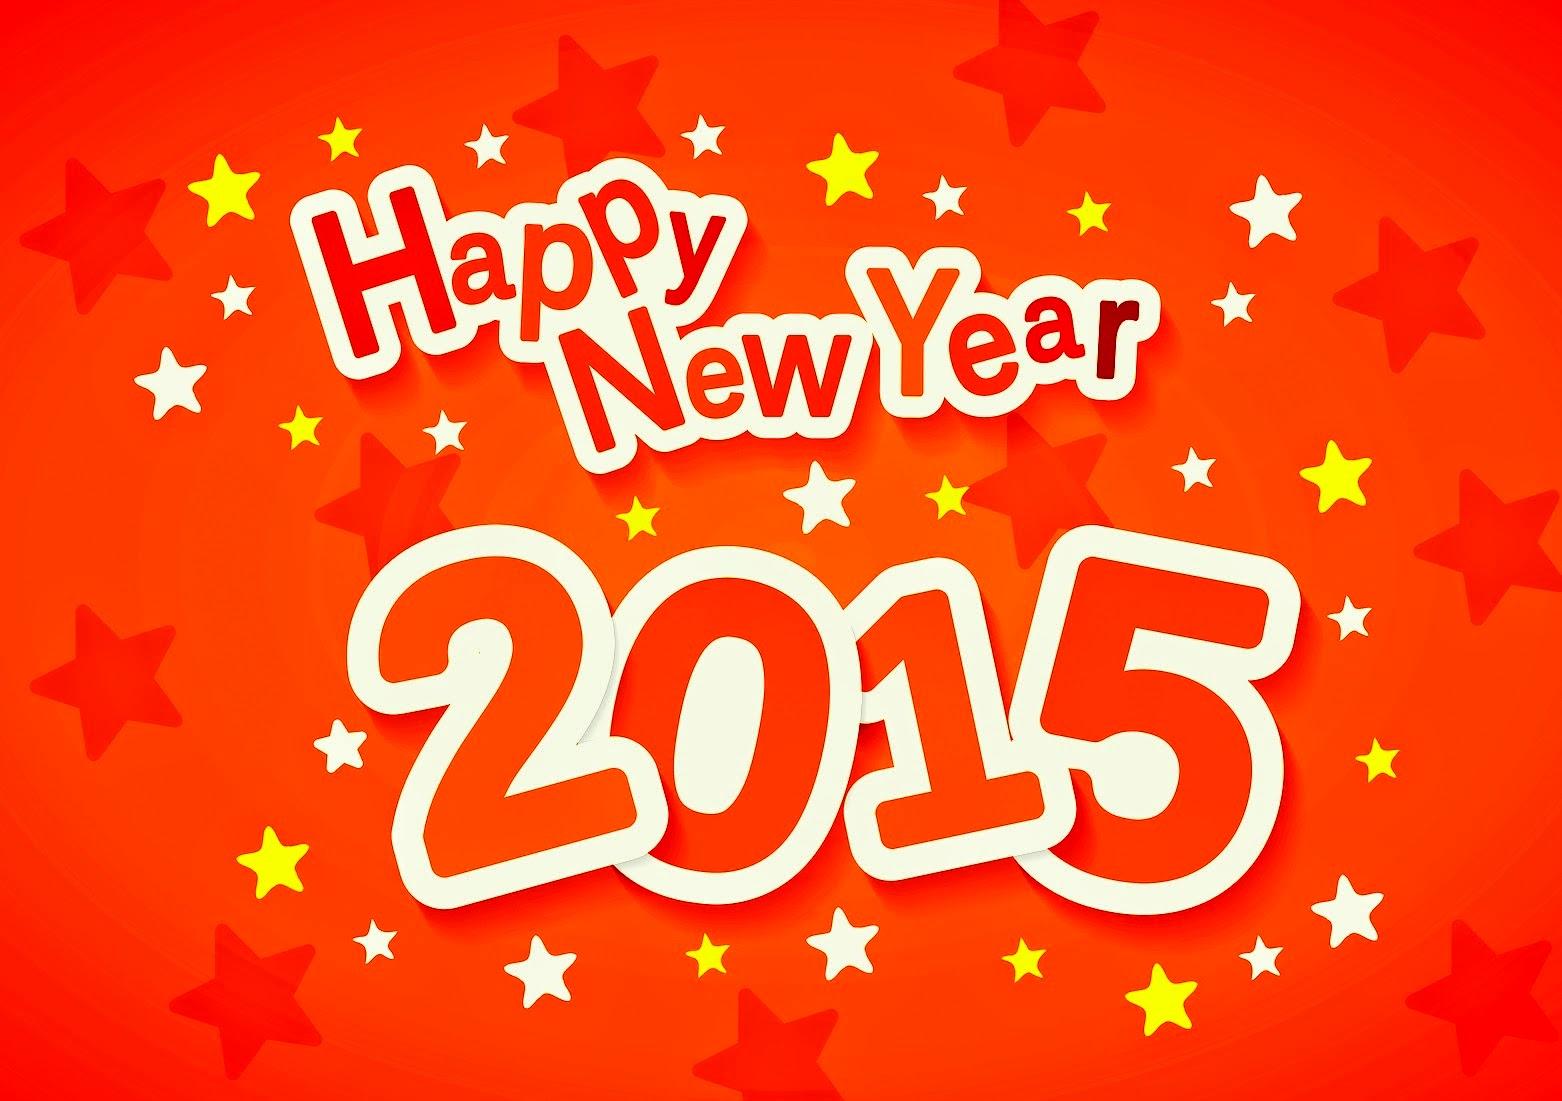 My Foliage Diary Happy New Year My 2015 With Family